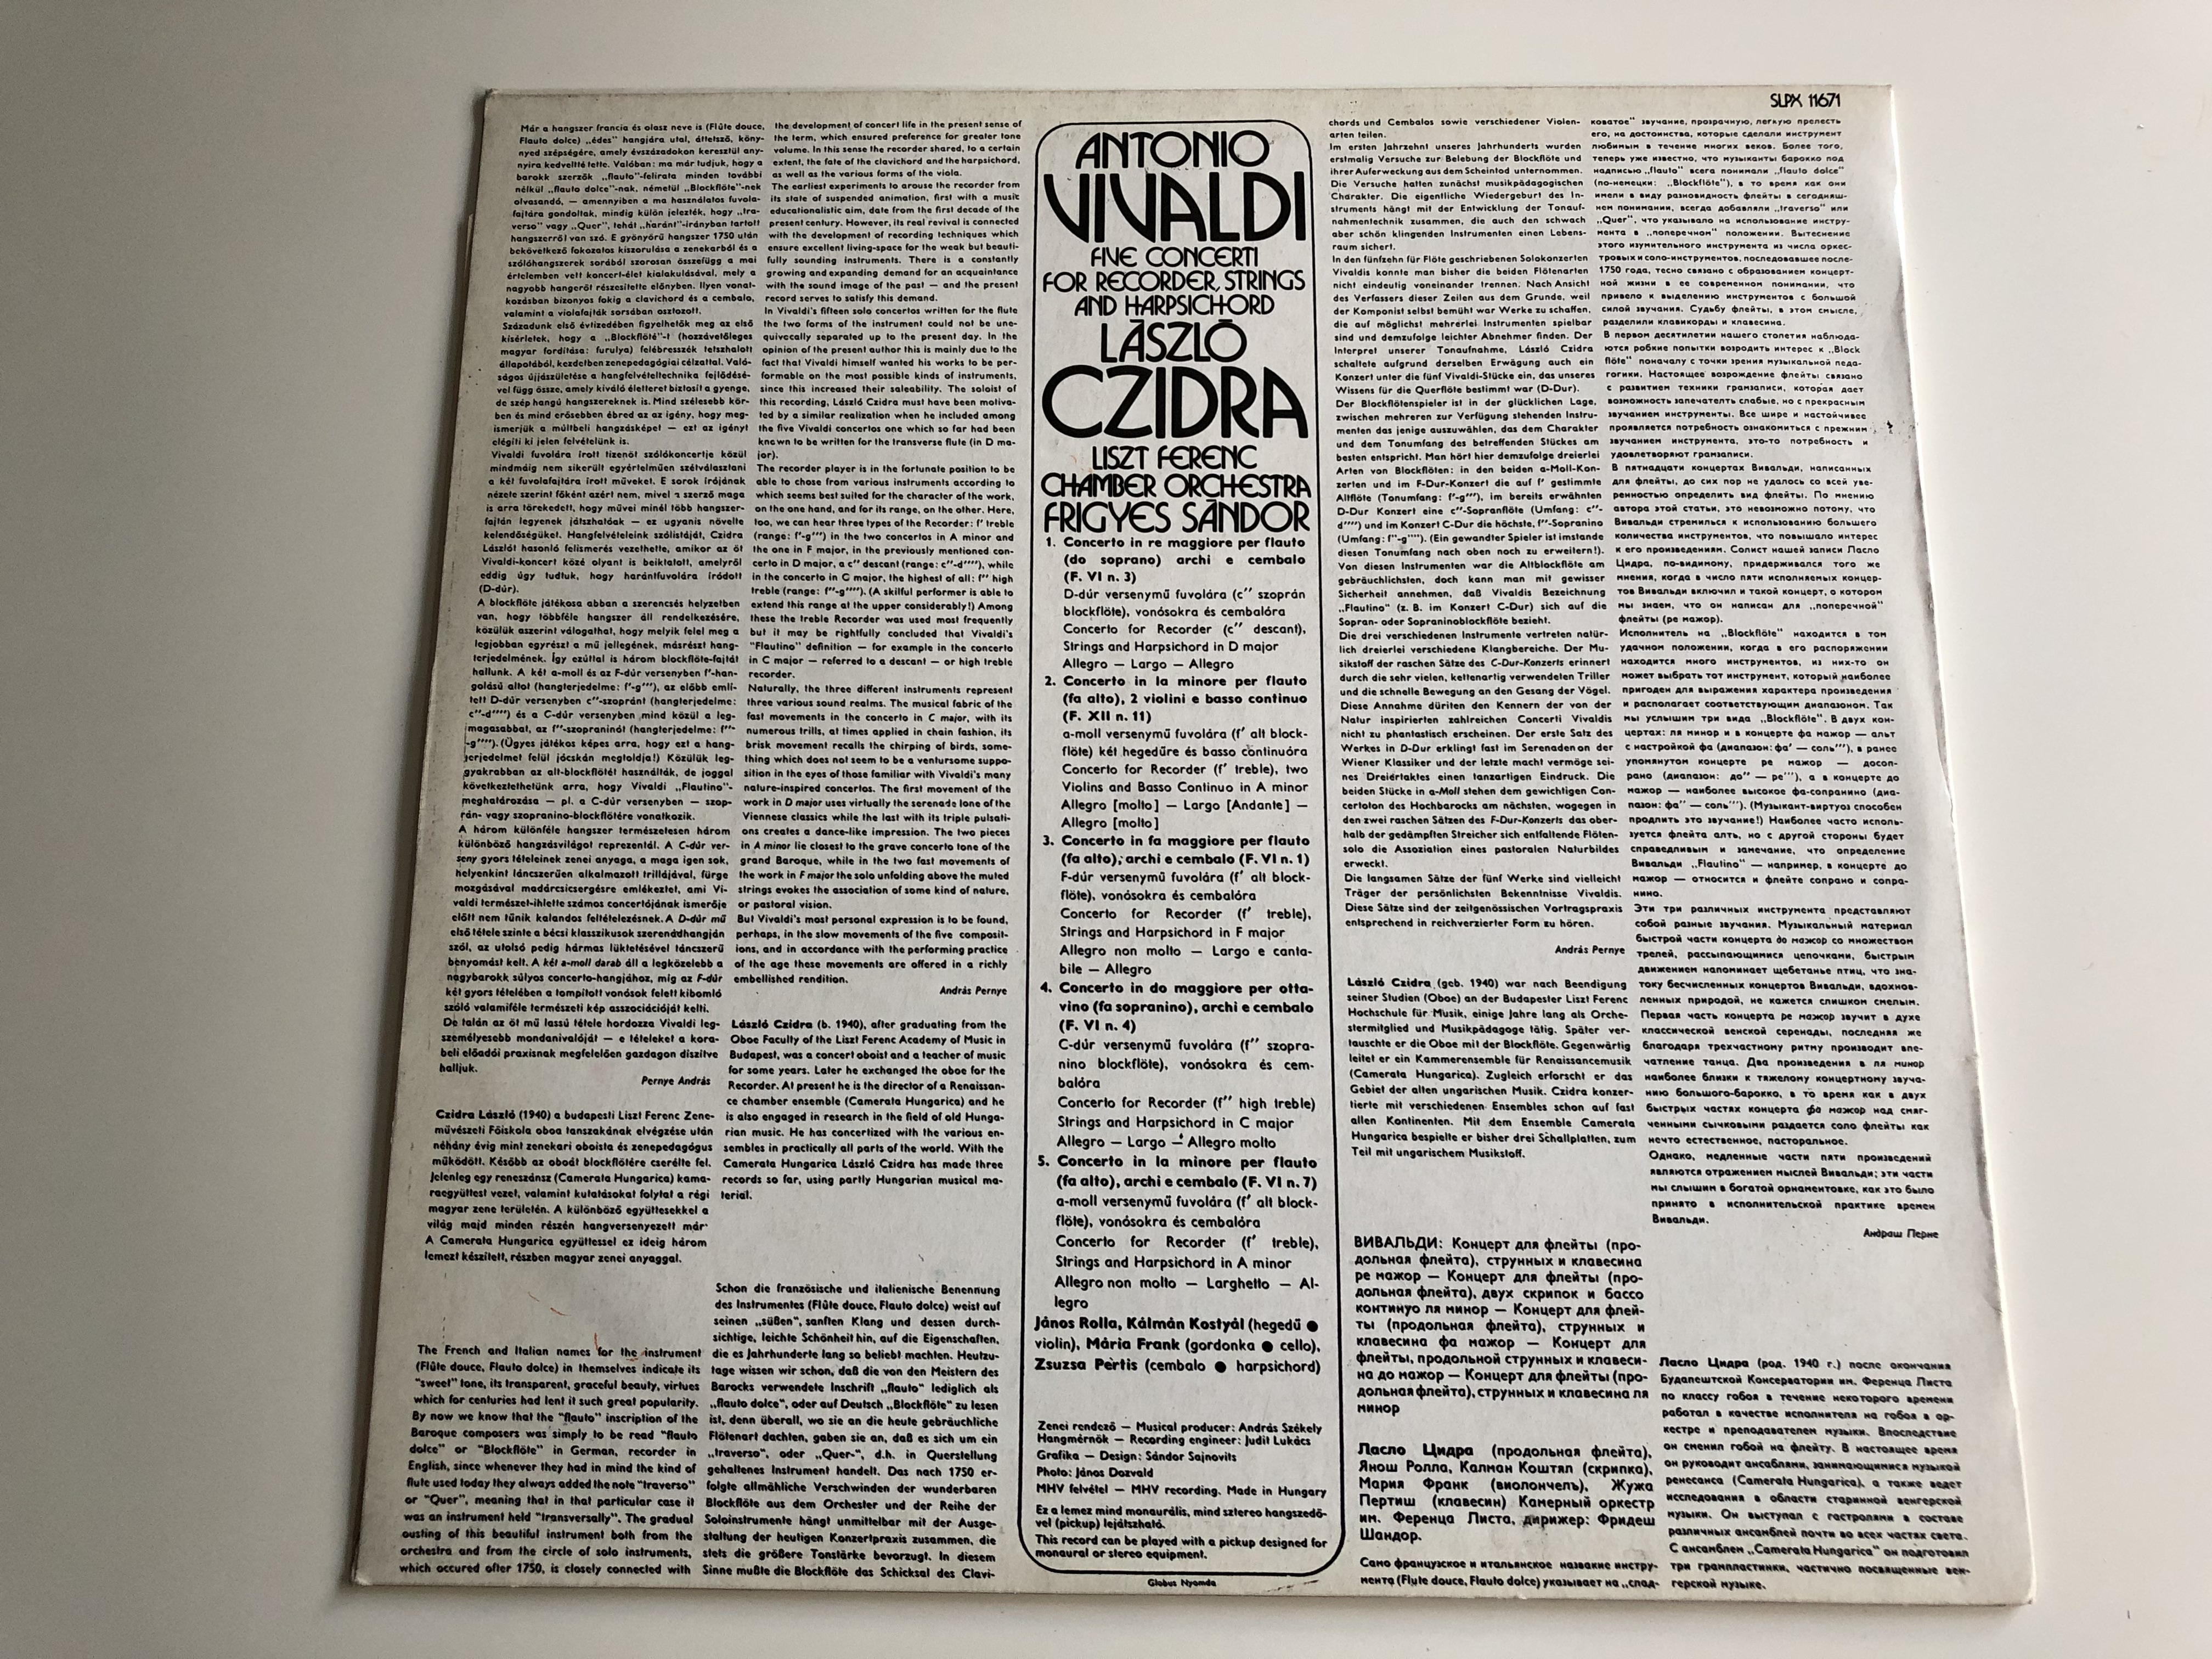 antonio-vivaldi-five-concerti-for-recorder-strings-and-harpsichord-conducted-frigyes-s-ndor-l-szl-czidra-liszt-ferenc-chamber-orchestra-hungaroton-lp-stereo-mono-slpx-11671-2-.jpg